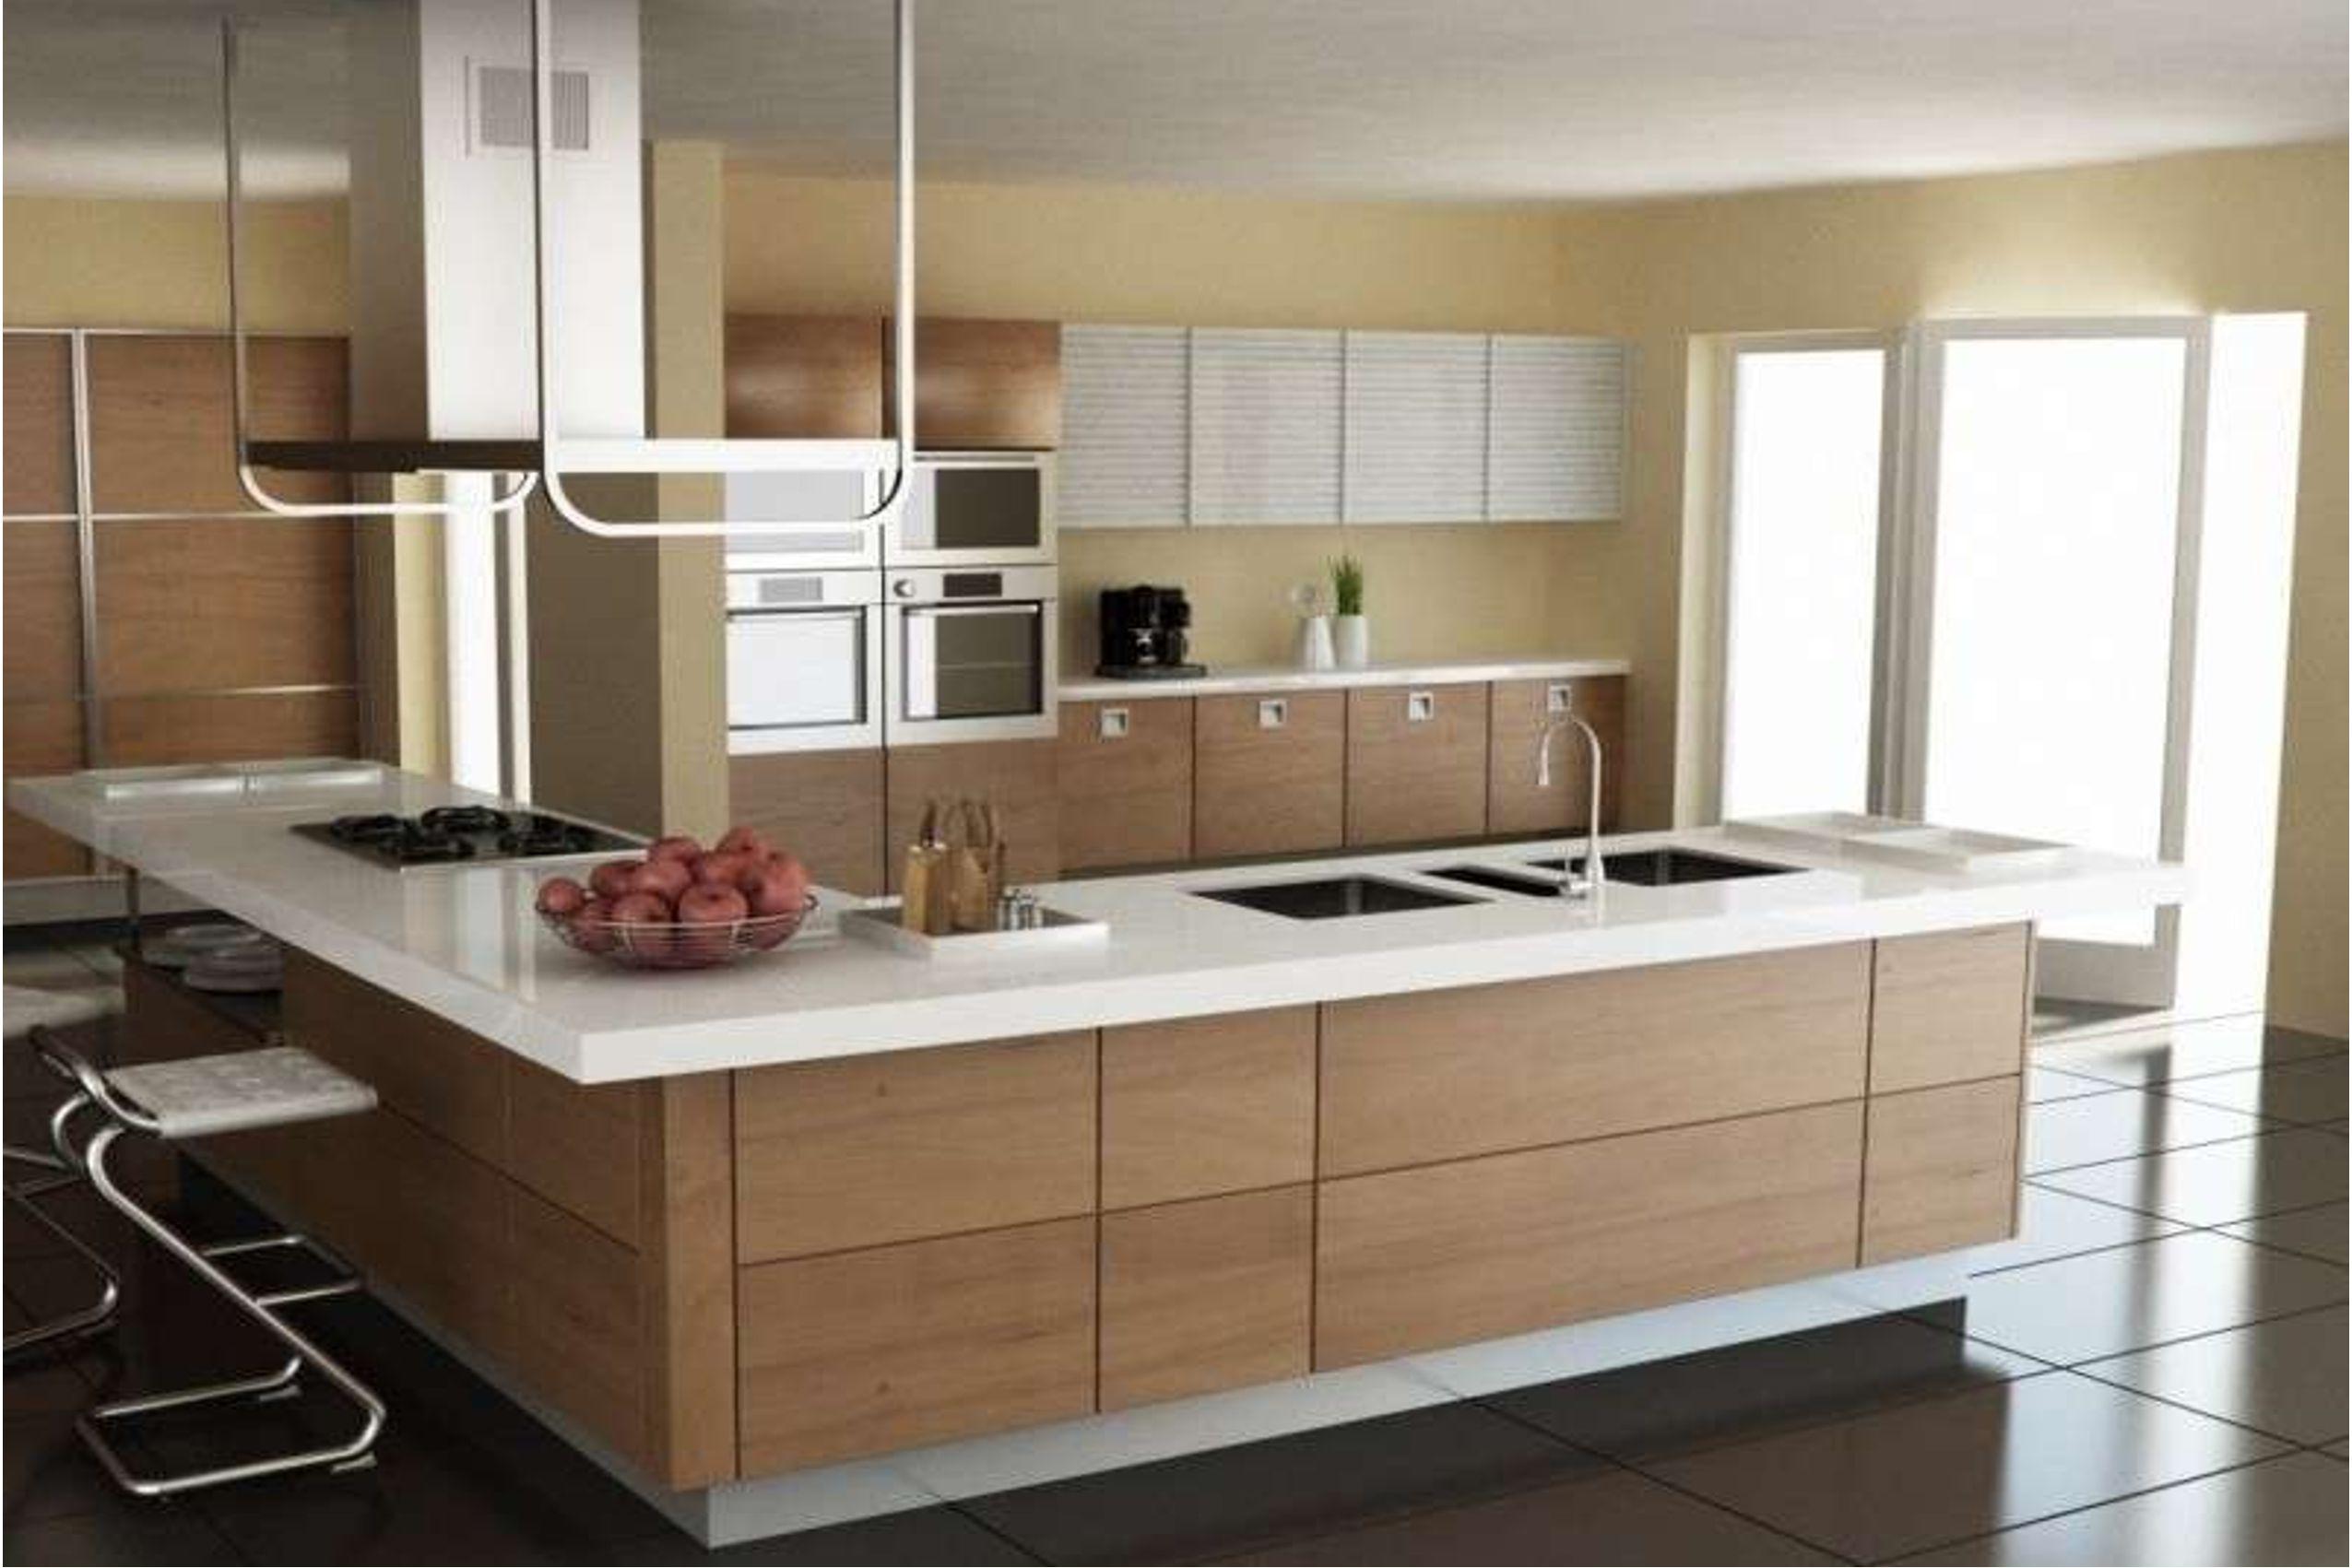 Cucina Bancone Snack.Cucina Moderna Con Snack Cucine Moderne Con Penisola Padova